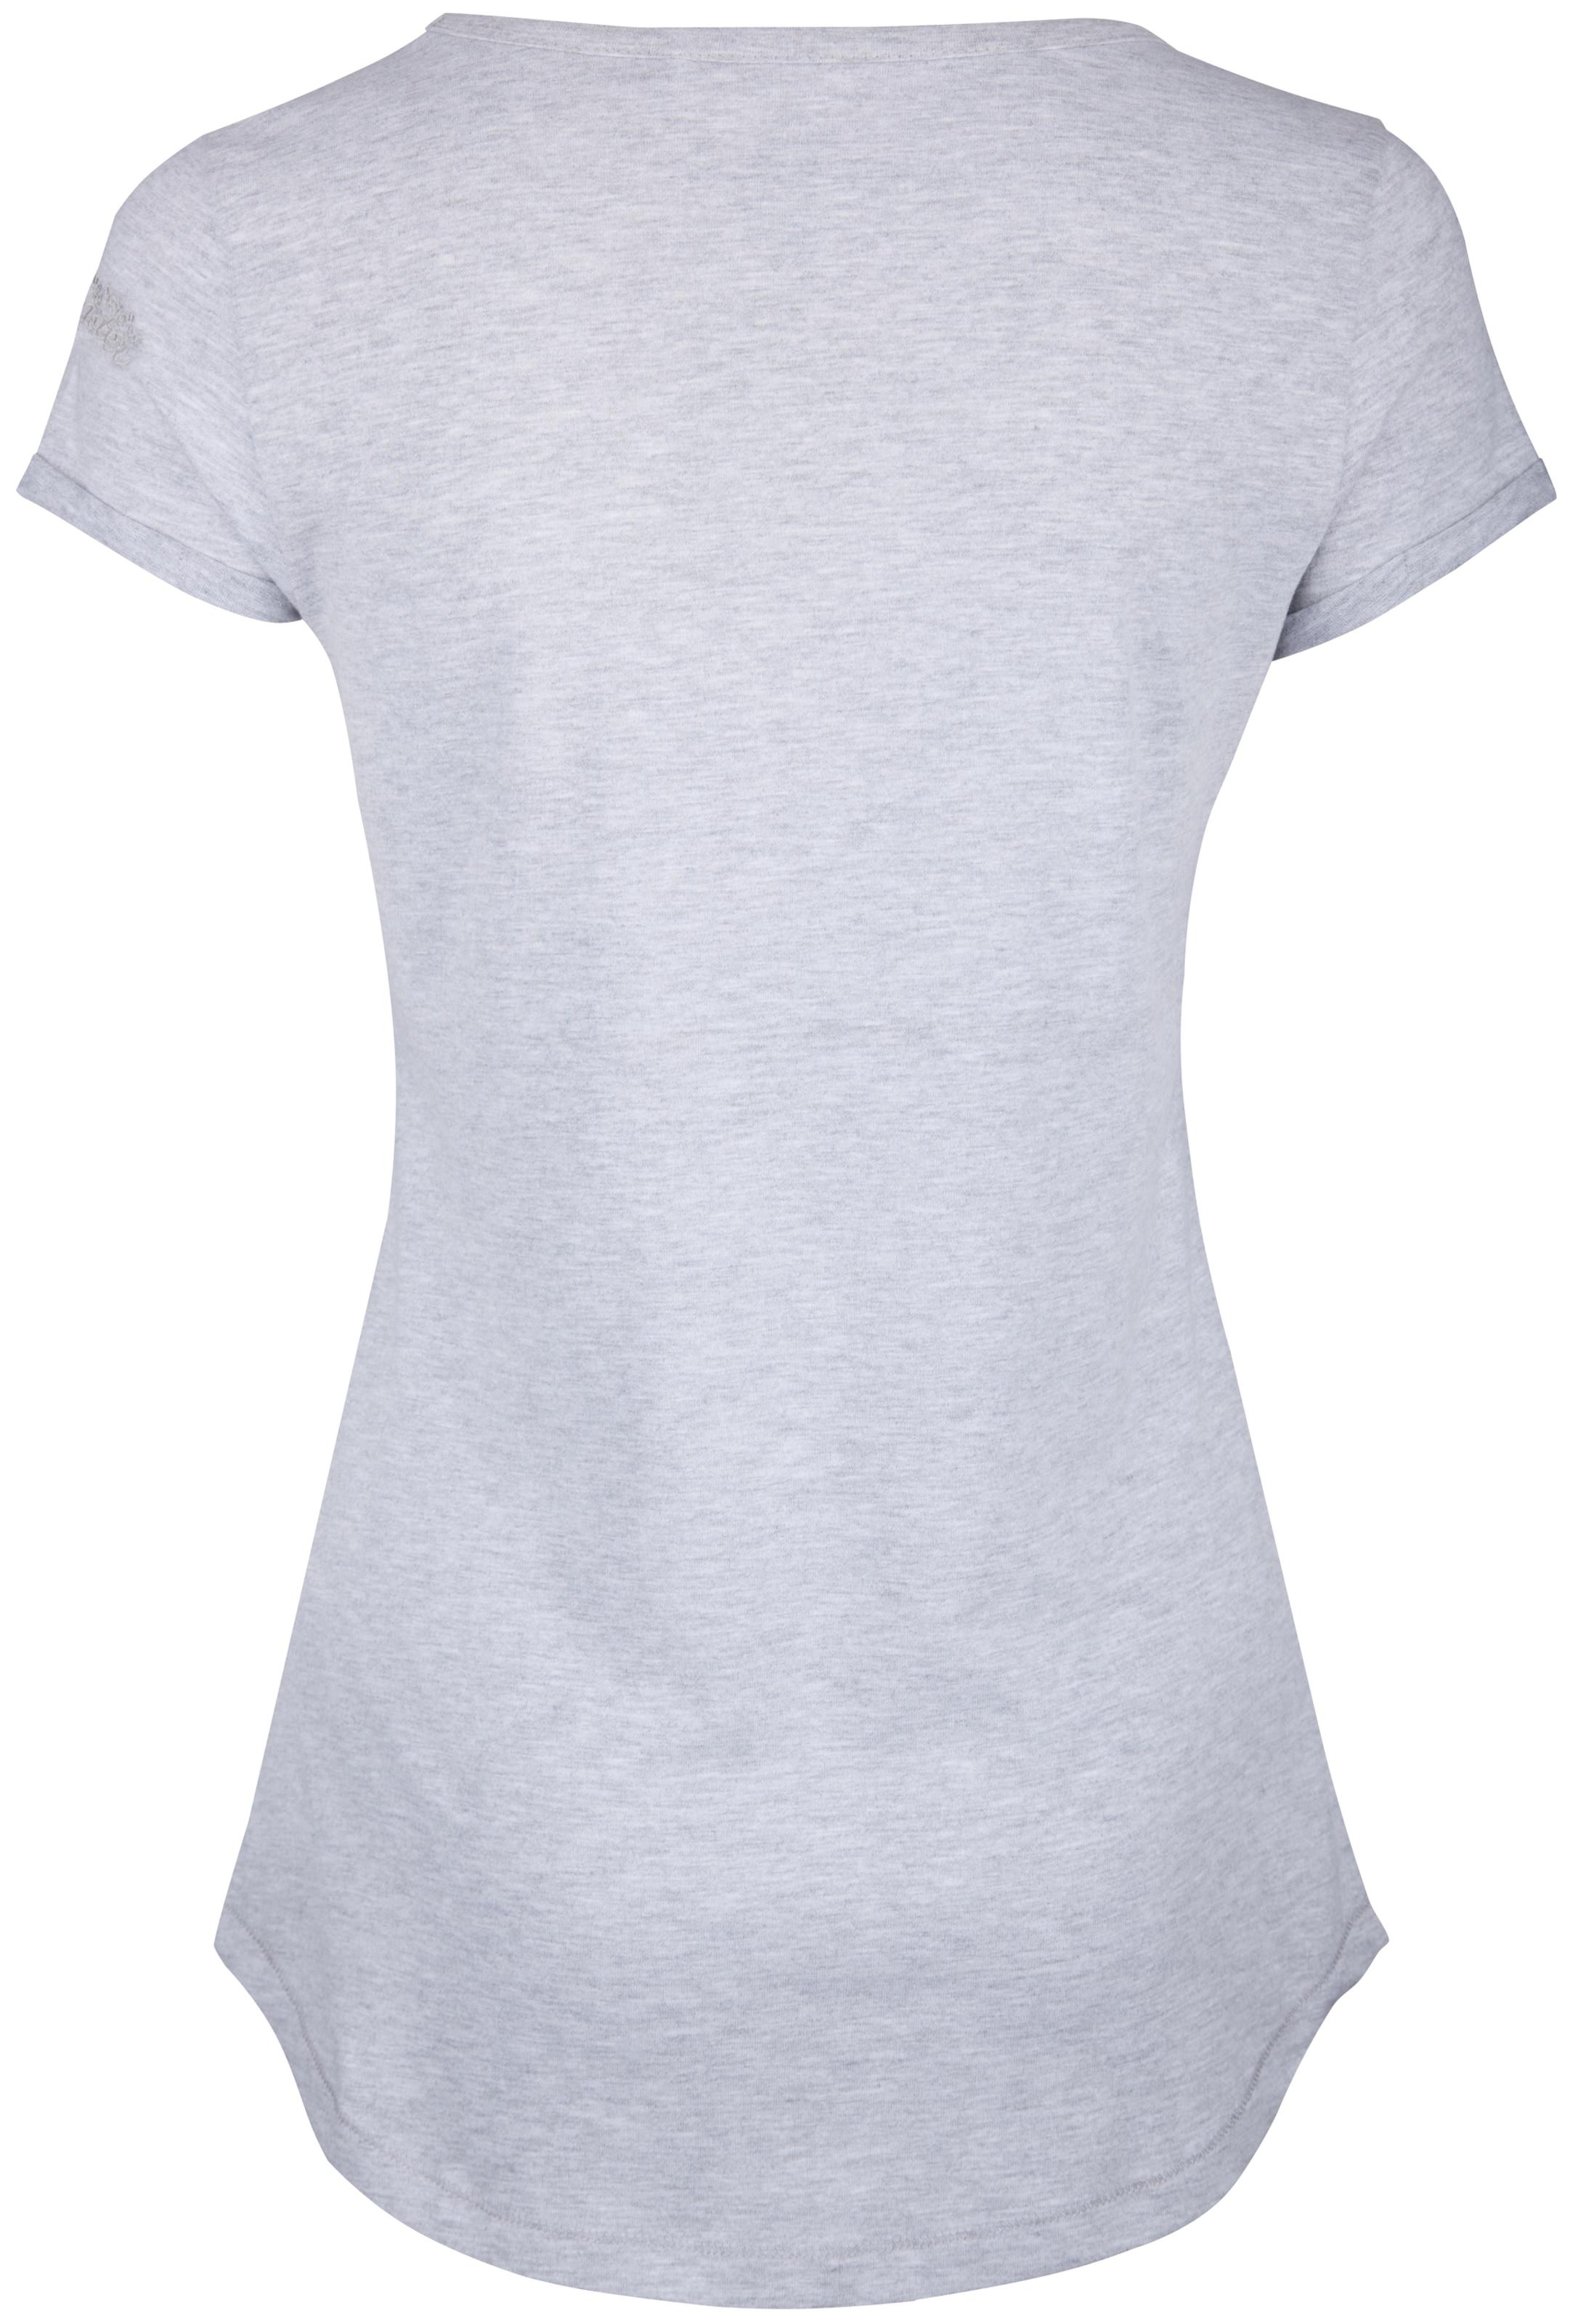 In Chiné DreimasterT shirt Gris 0OkX8nPNw